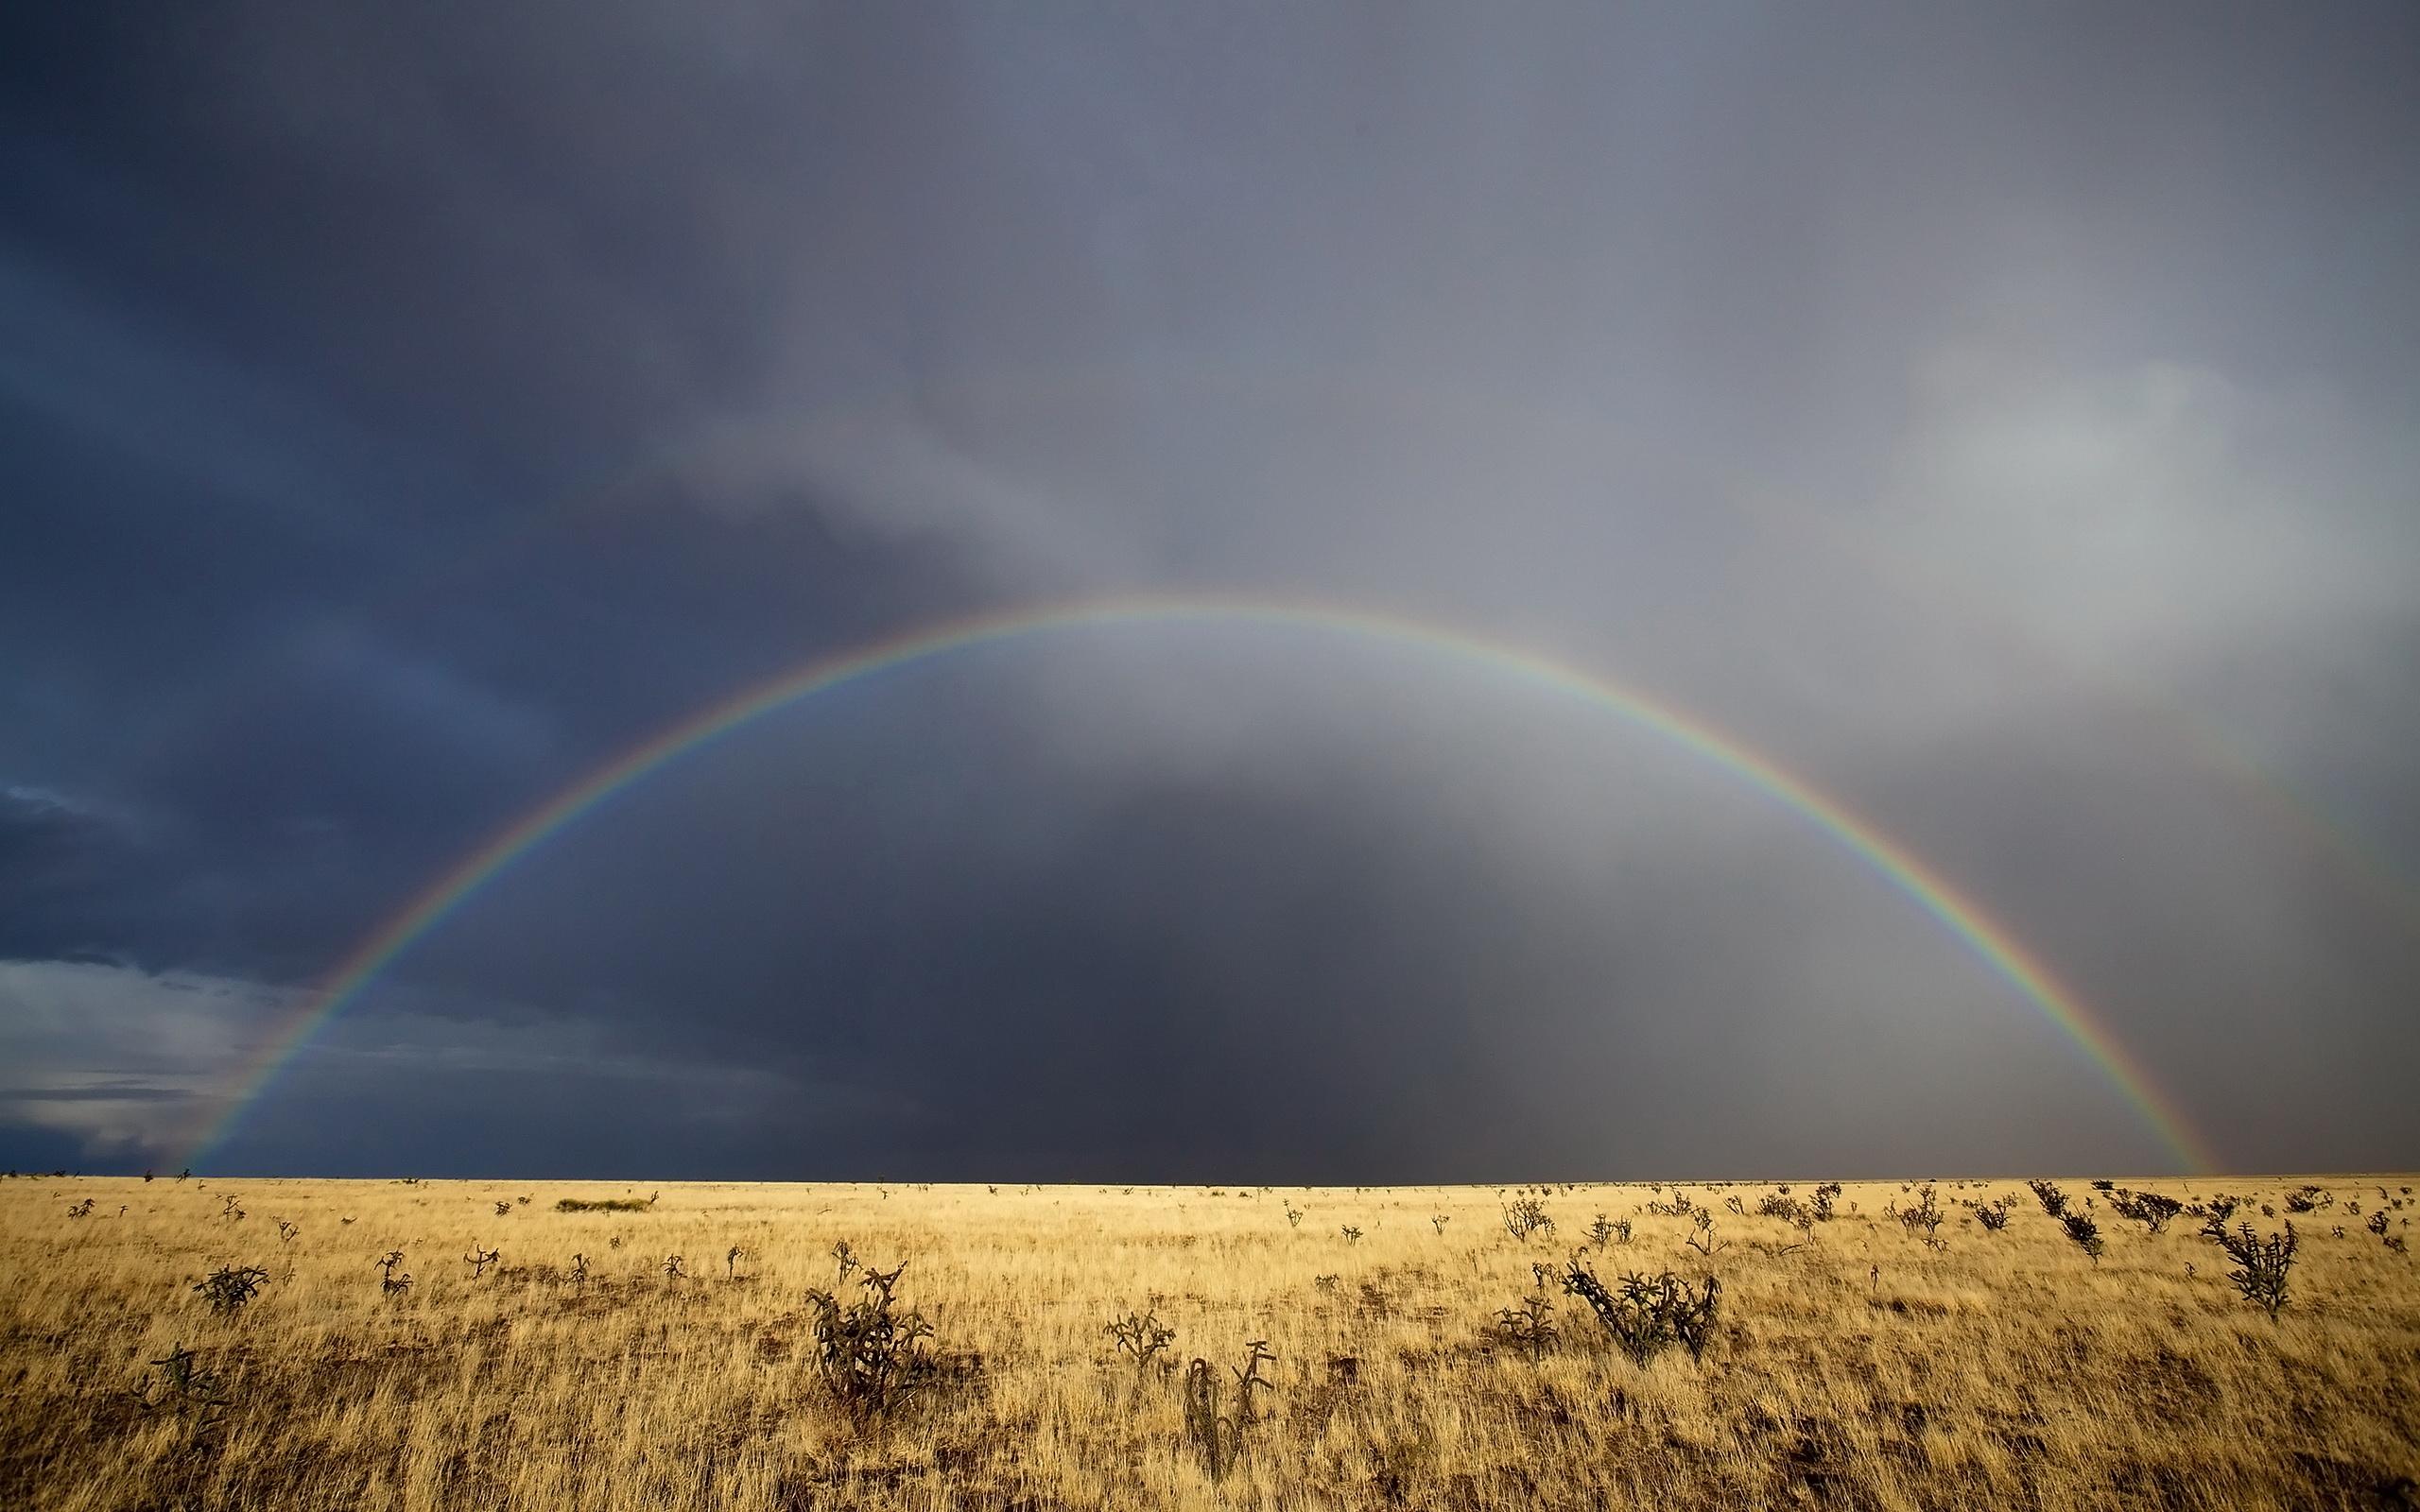 Rainbow in New Mexico Desktop Wallpapers FREE on Latorocom 2560x1600